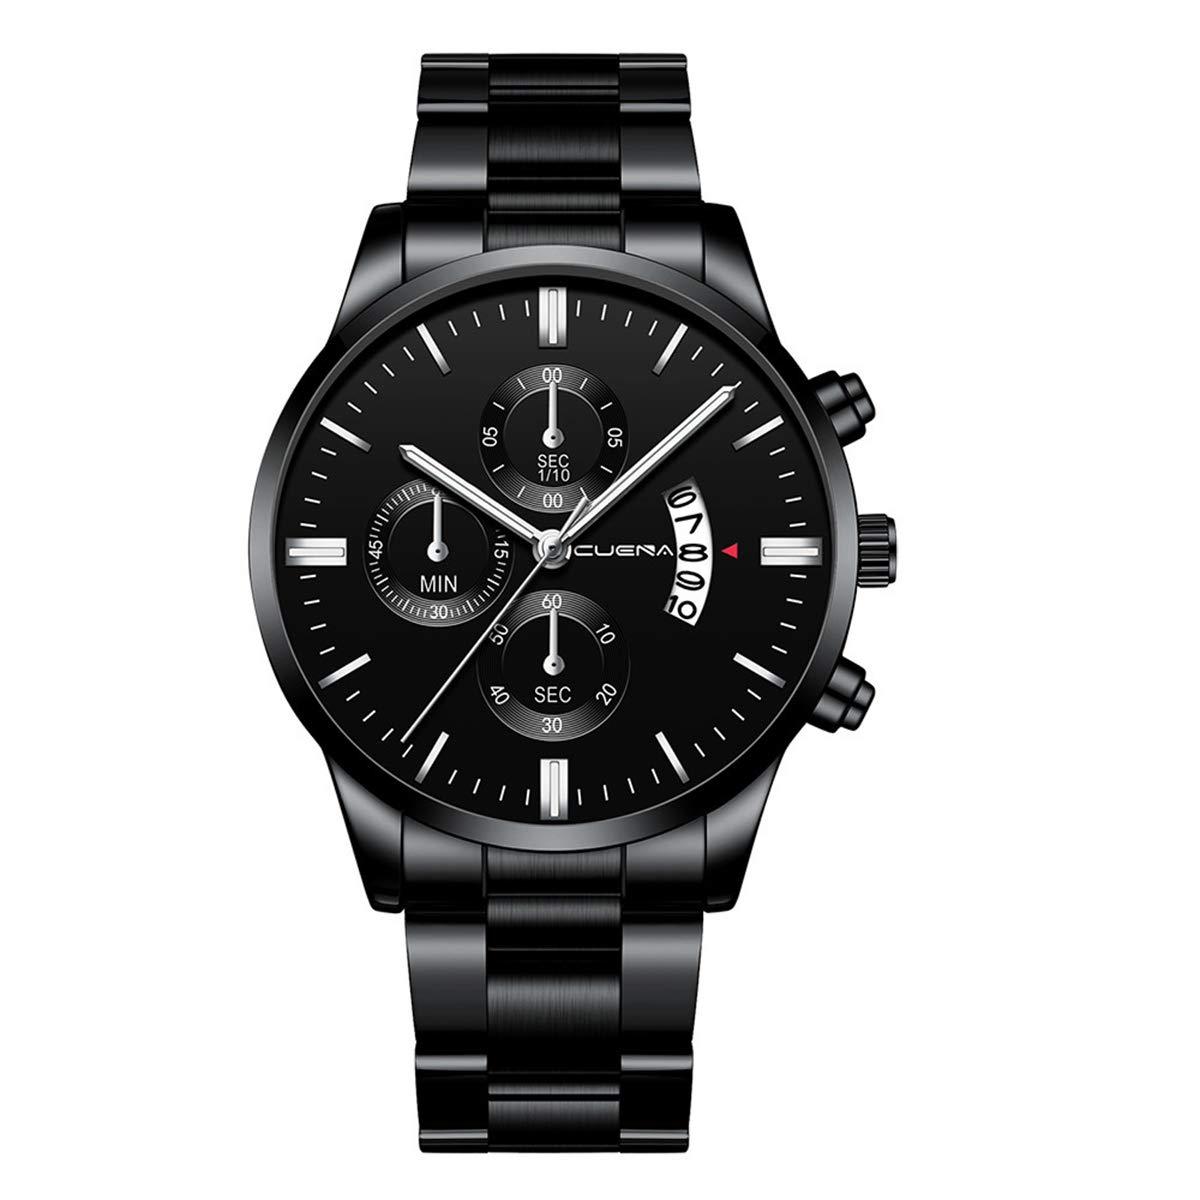 ZODRQ Men's Watch,Fashion Waterproof Sport Watches Stainless Steel Wrist Watch Wristwatch Date Quartz Watch for Men Gift (D) by ZODRQ